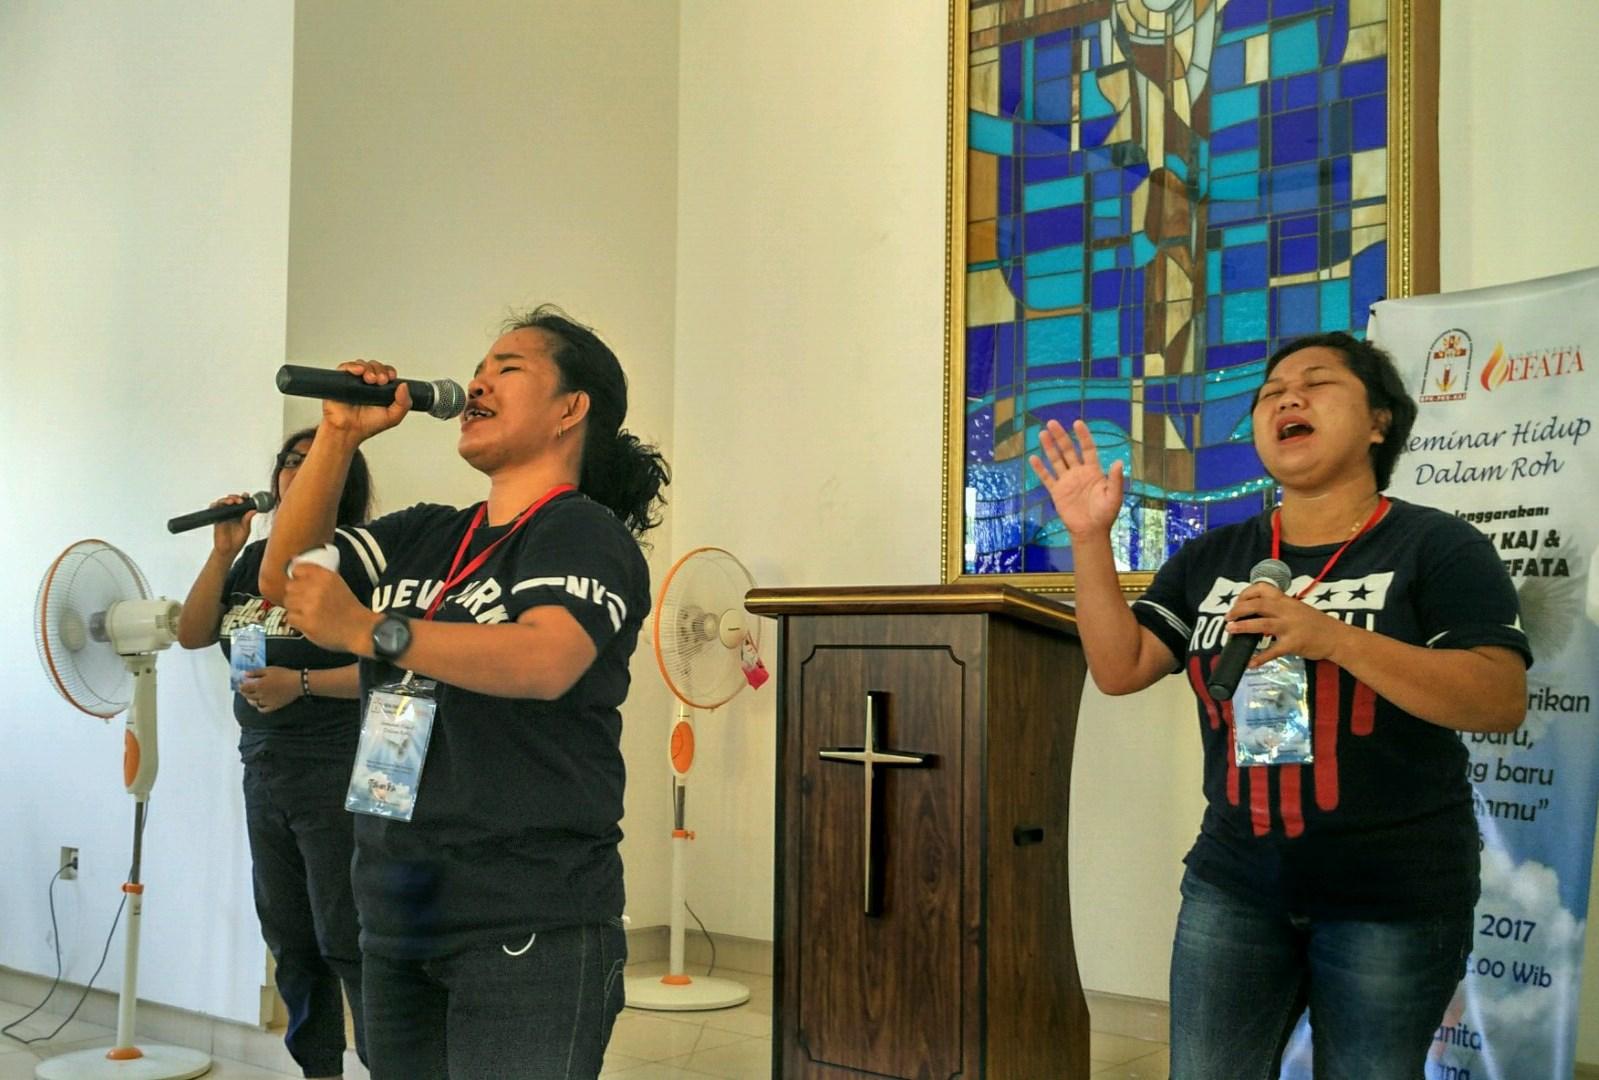 Seminar Hidup Dalam Roh Di Lapas Wanita Tangerang